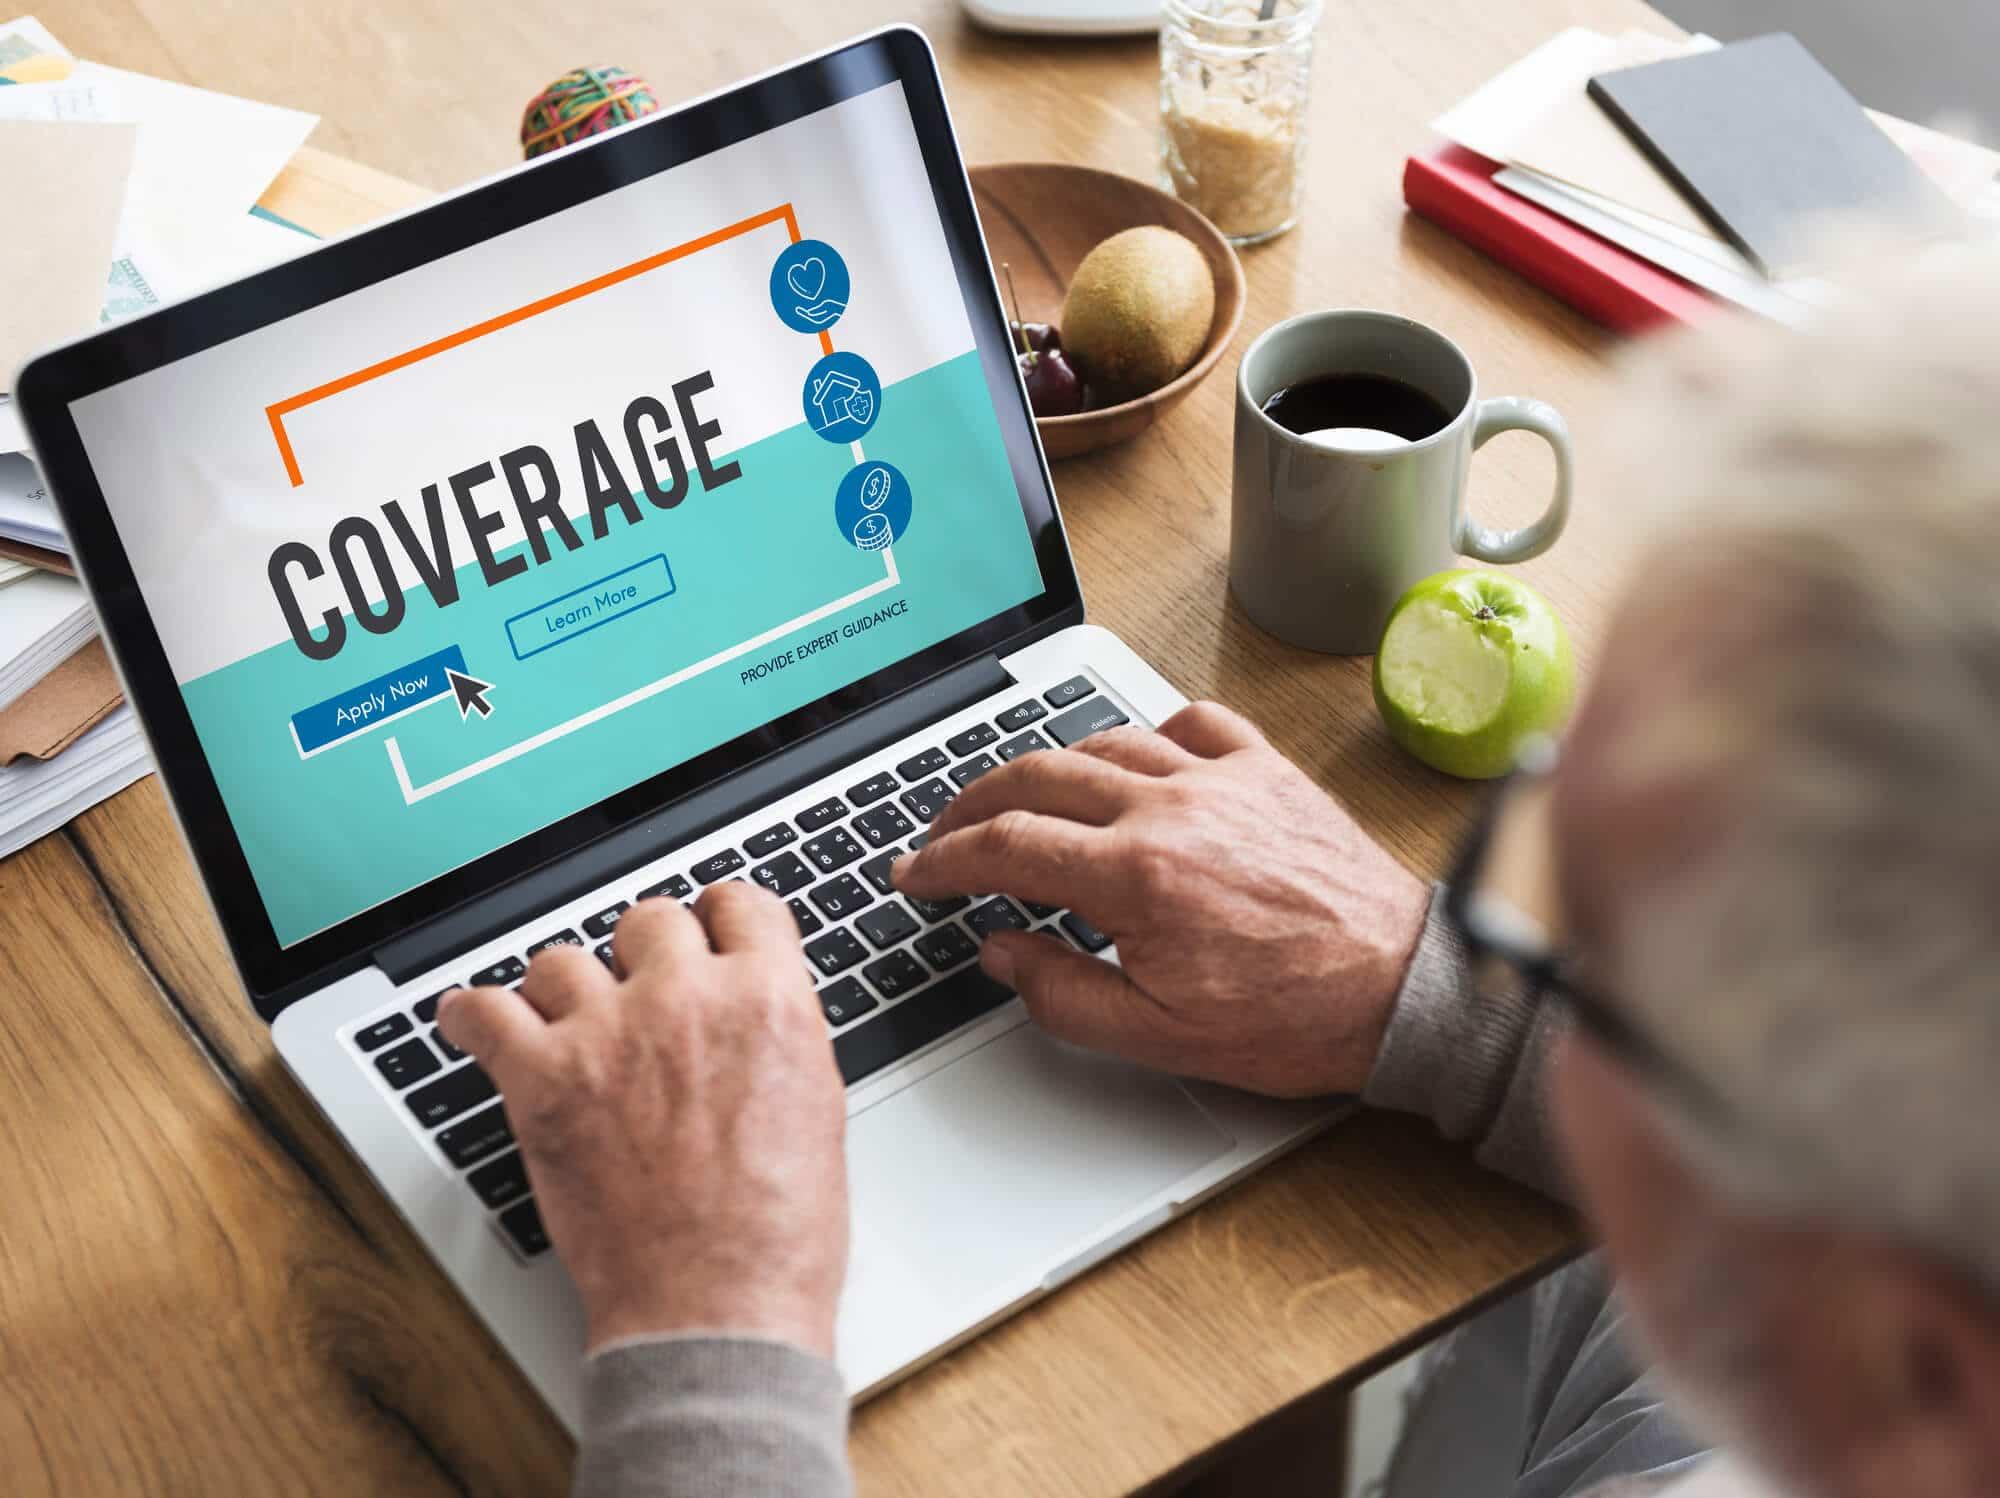 Man accessing online insurance portal through laptop